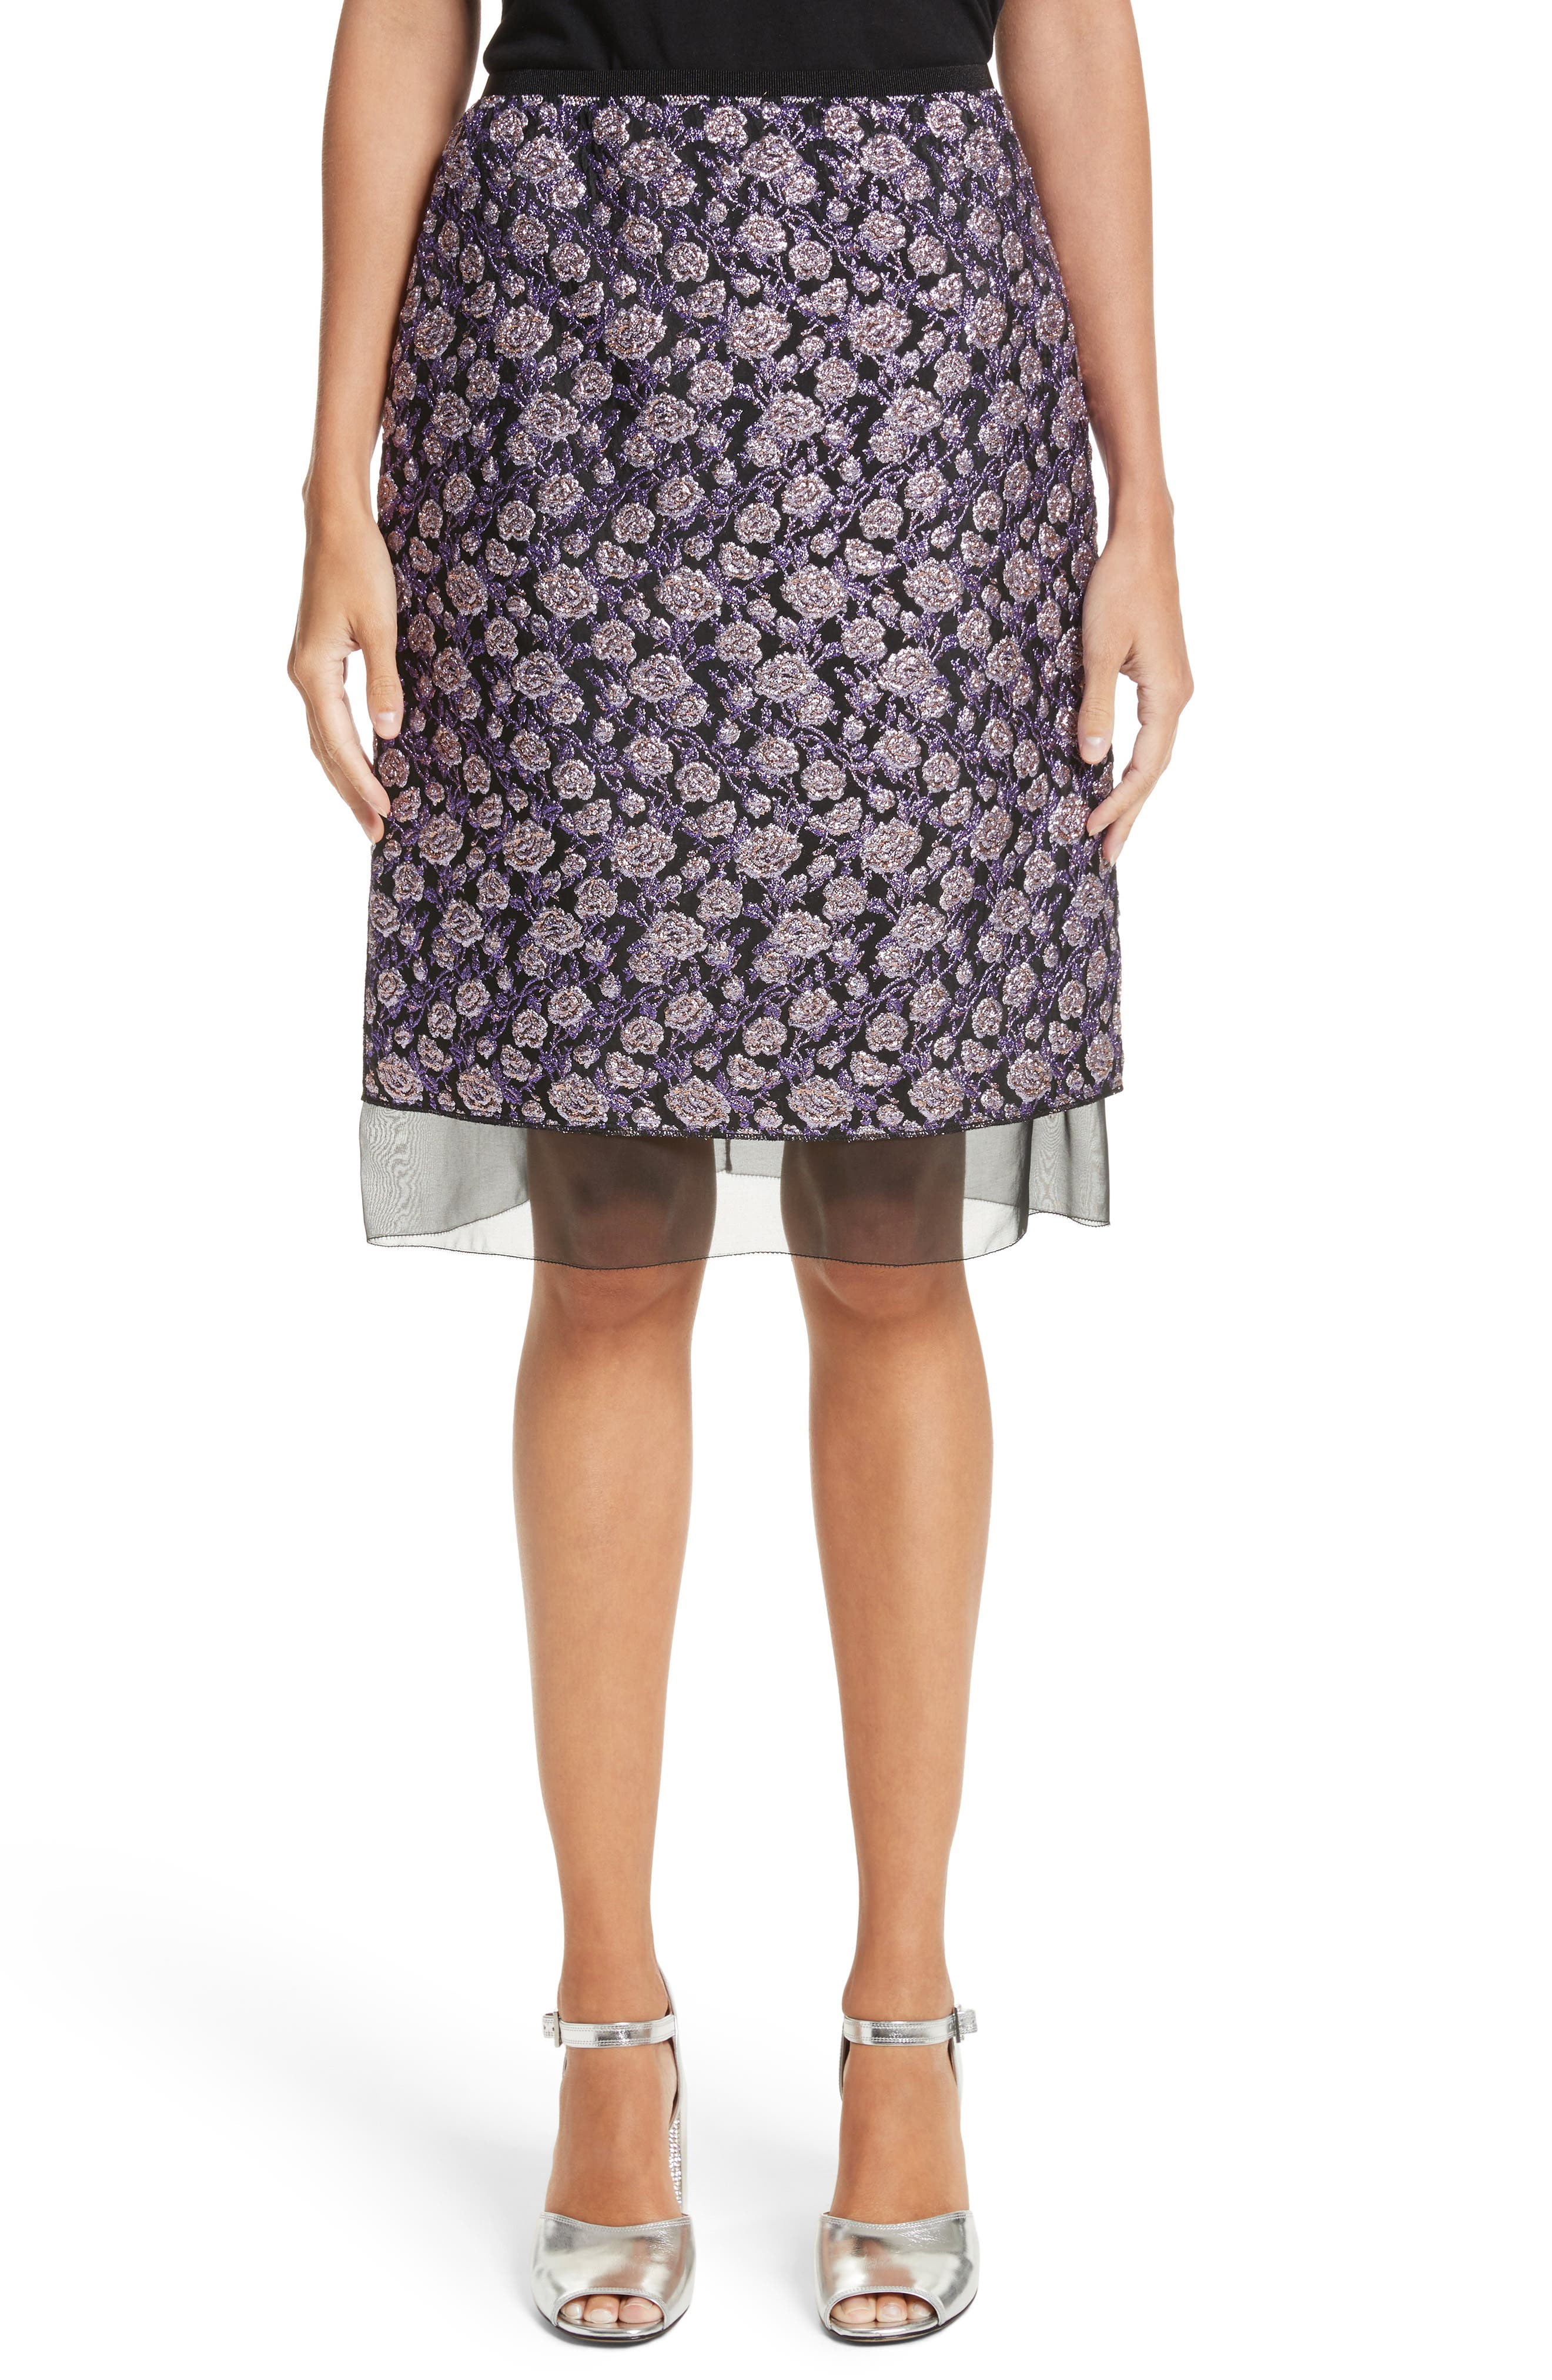 MARC JACOBS Metallic Jacquard Pencil Skirt